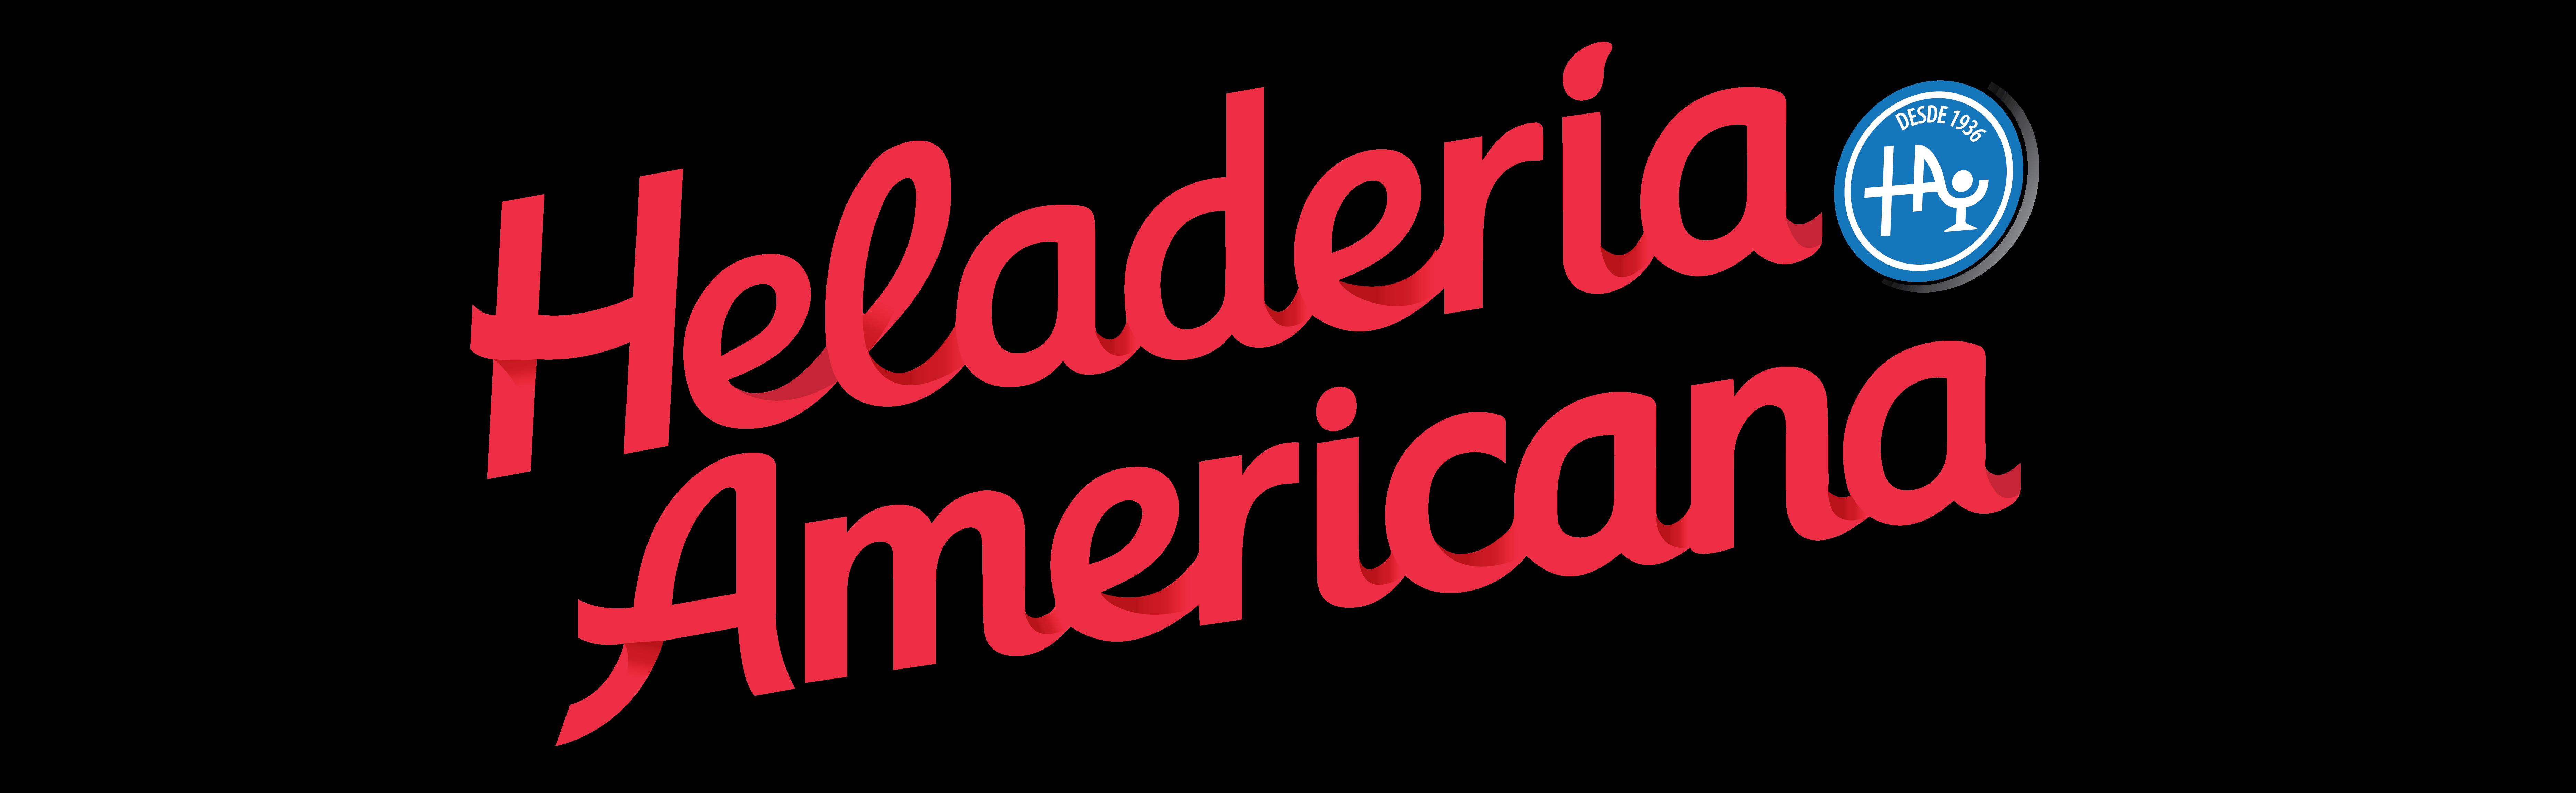 Heladeria Americana